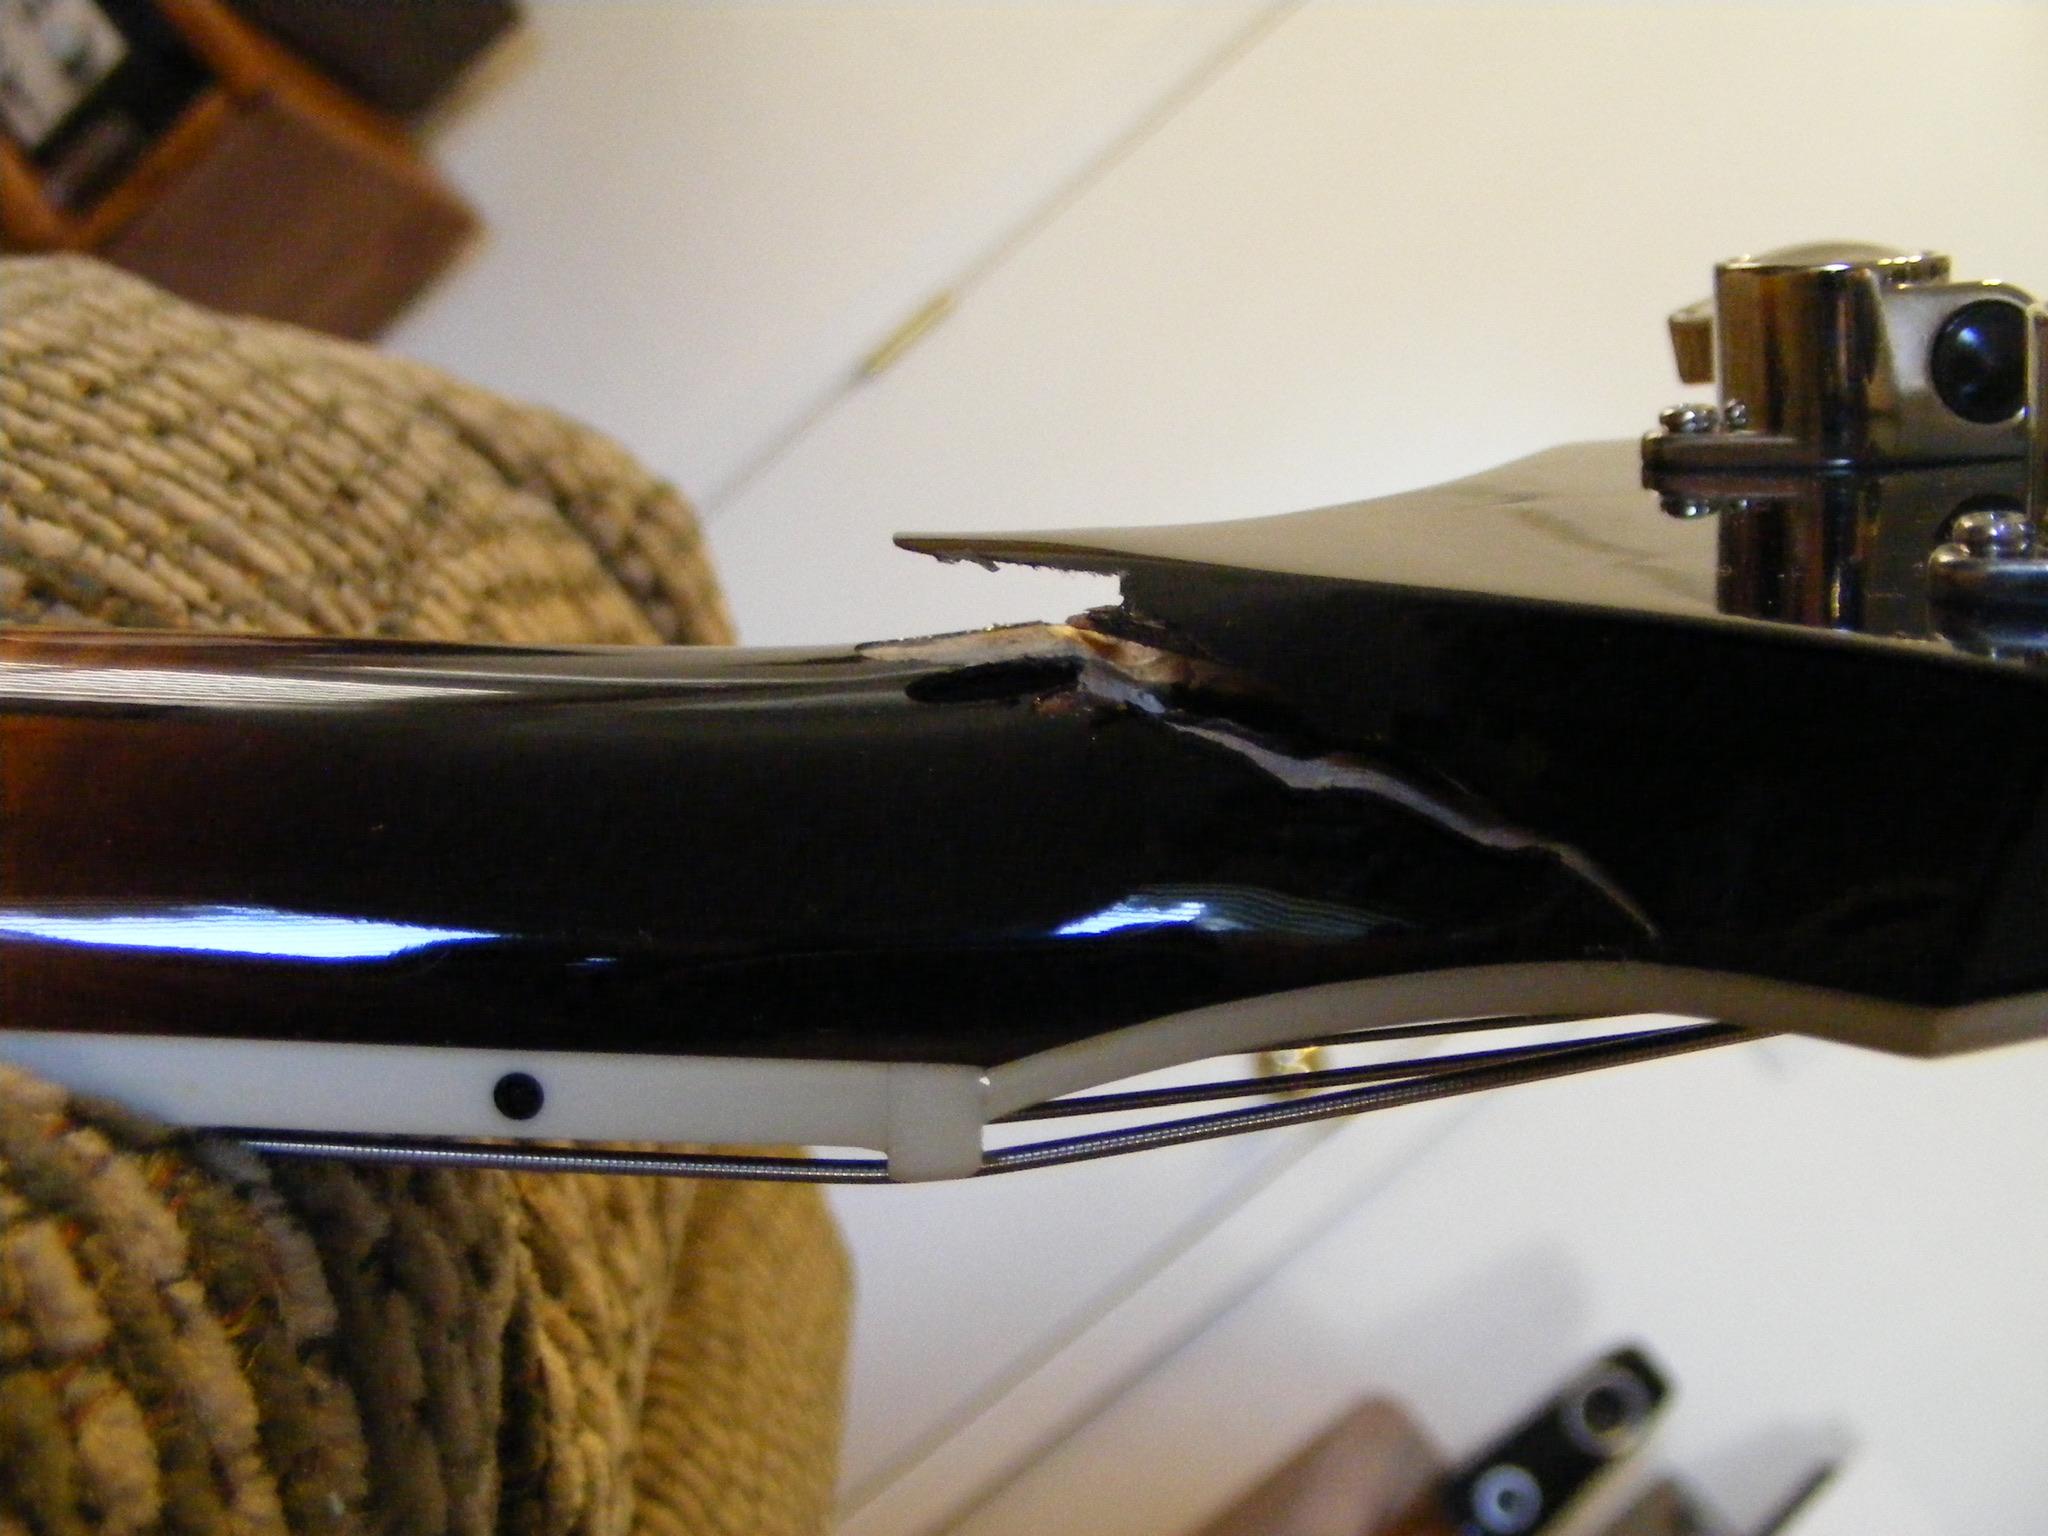 Gibson vs Campellone headstocks-dec01fa7-a69d-4245-bc5d-83b4322aa17a-jpeg